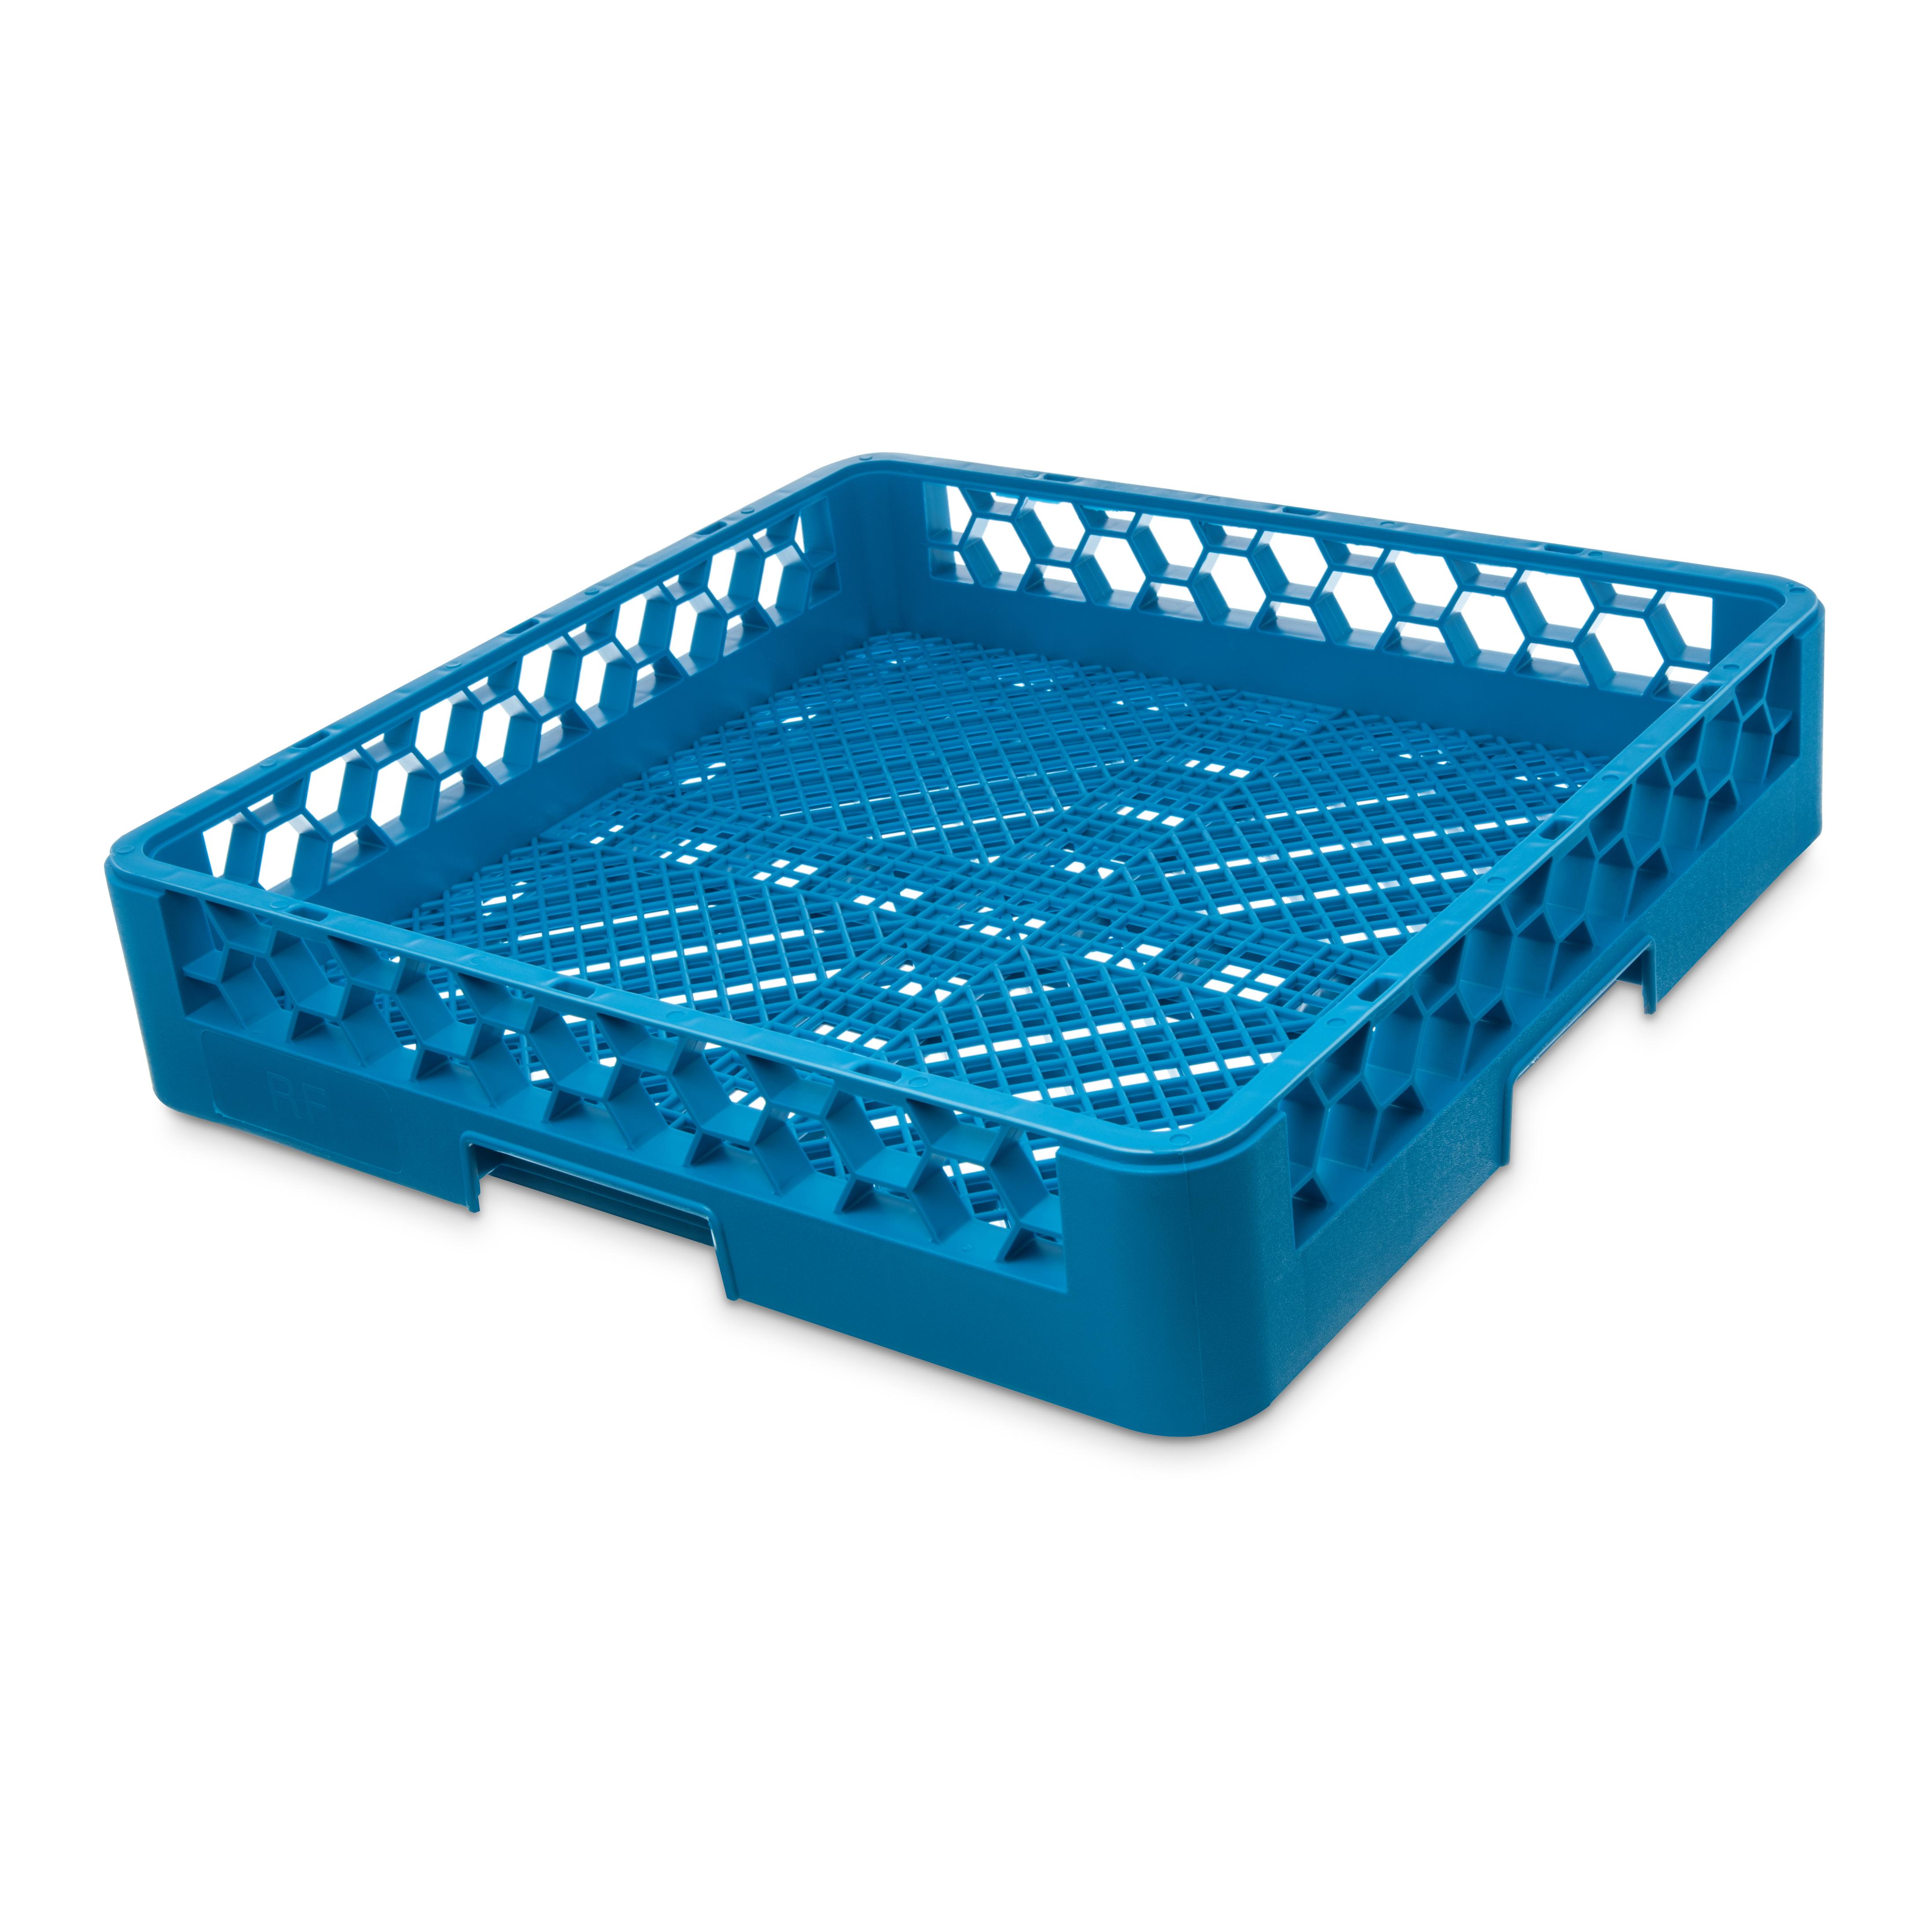 Carlisle RF14 dishwasher rack, for flatware